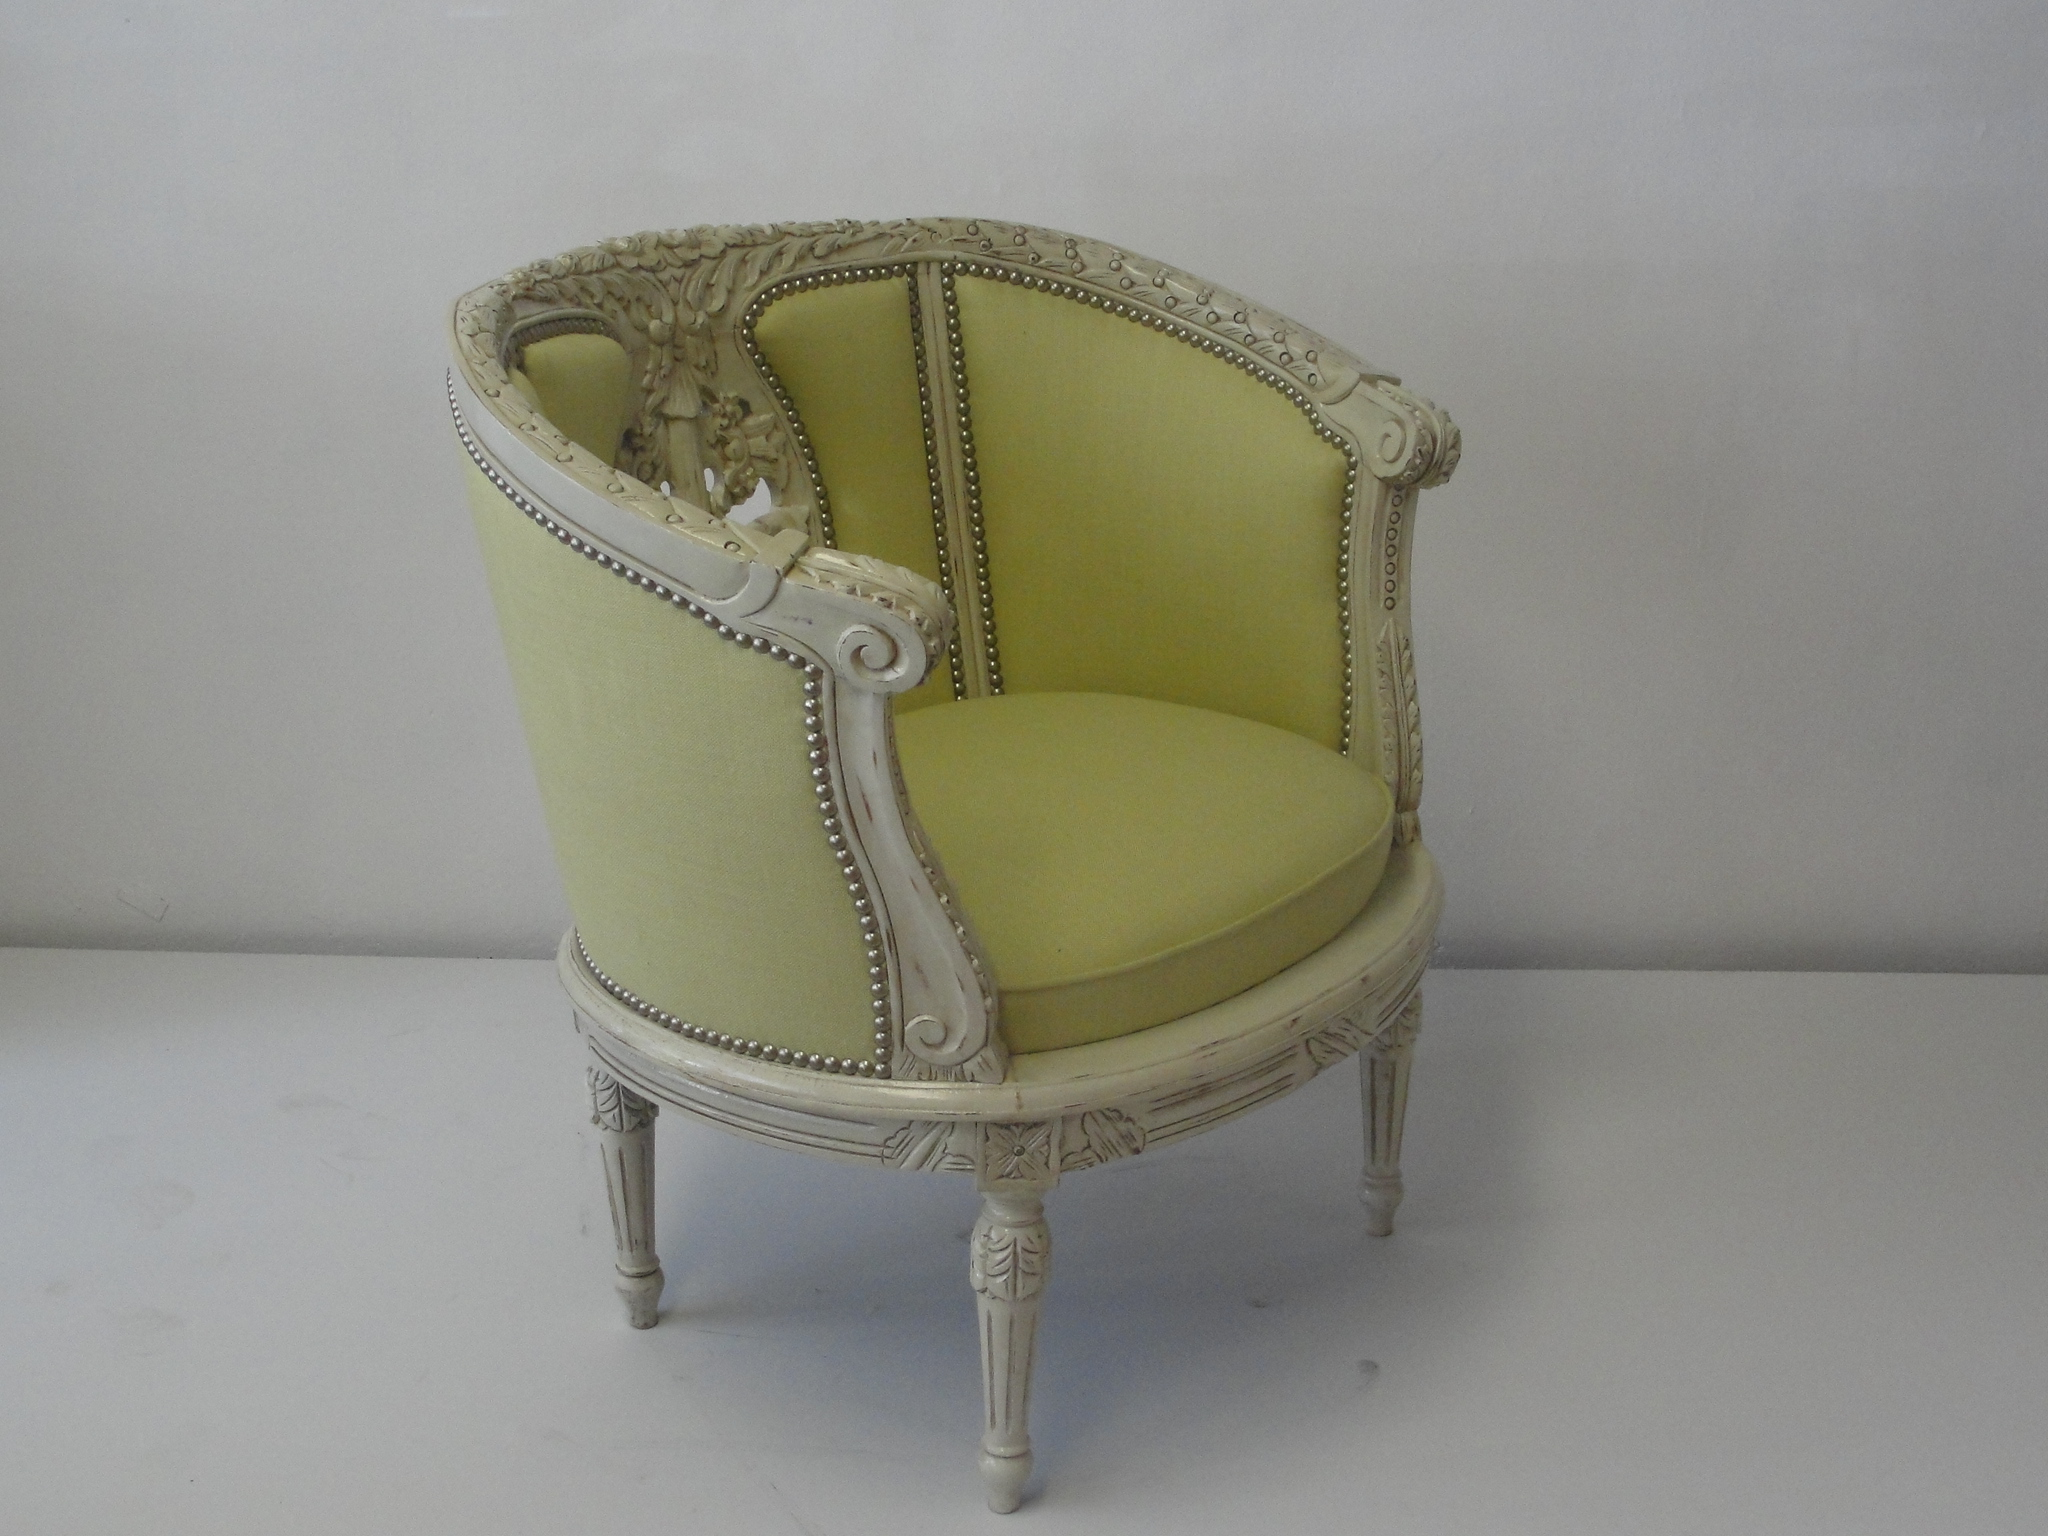 Custom Furniture Design Gallery Interiors By E Jinteriors By E J